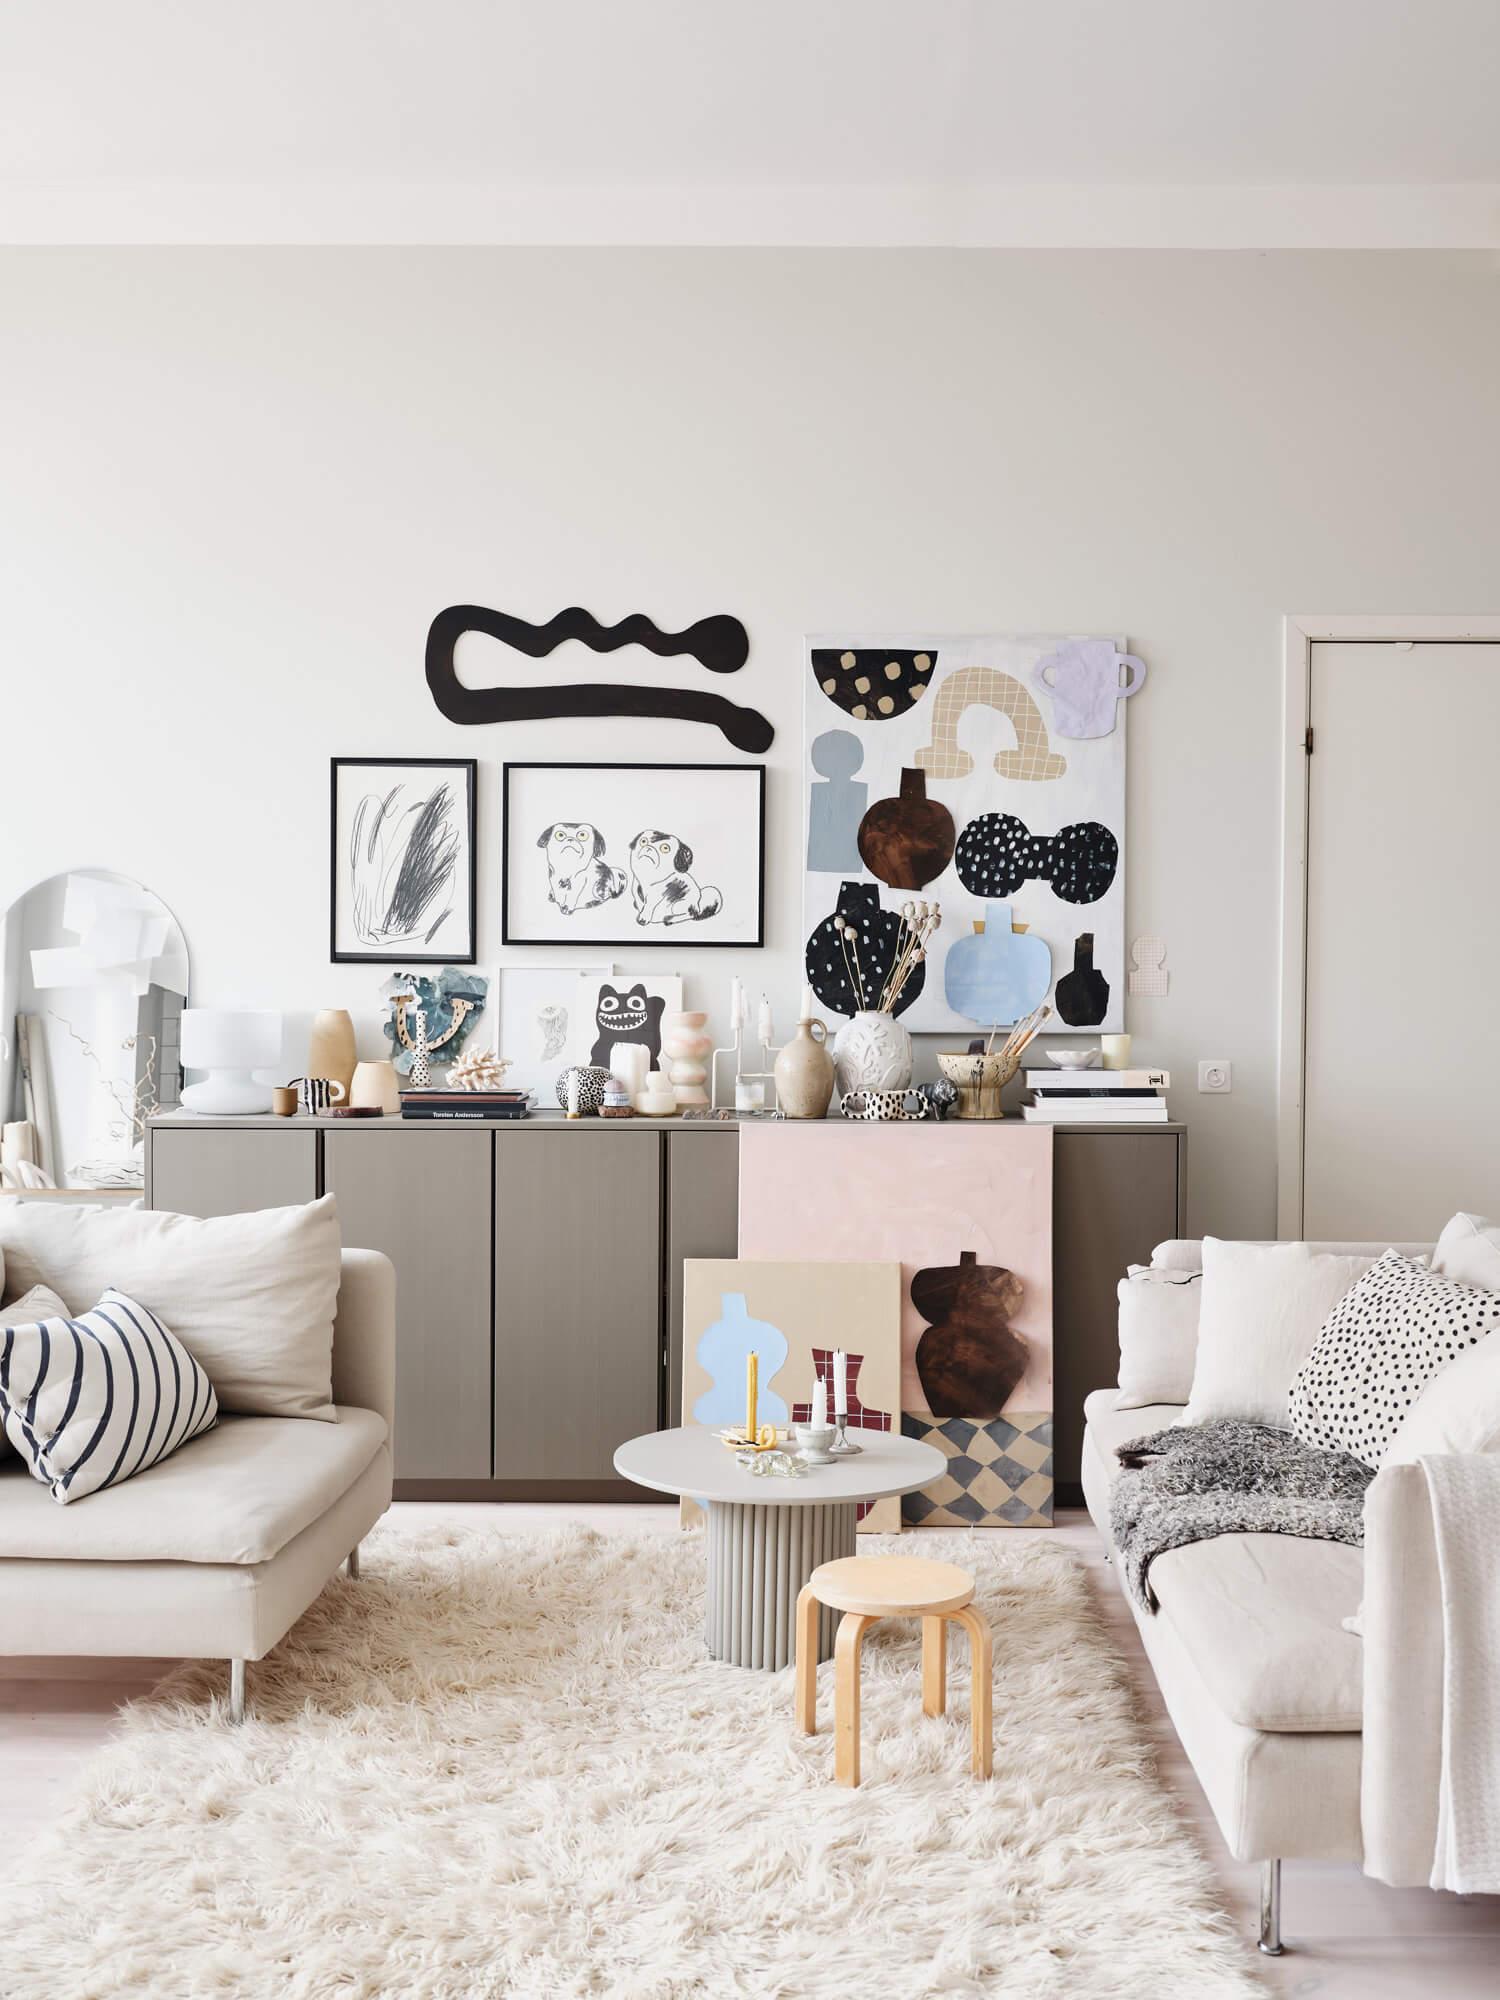 Subtle Pastel Hues In The Home Of Swedish Artist Emilia Ilke